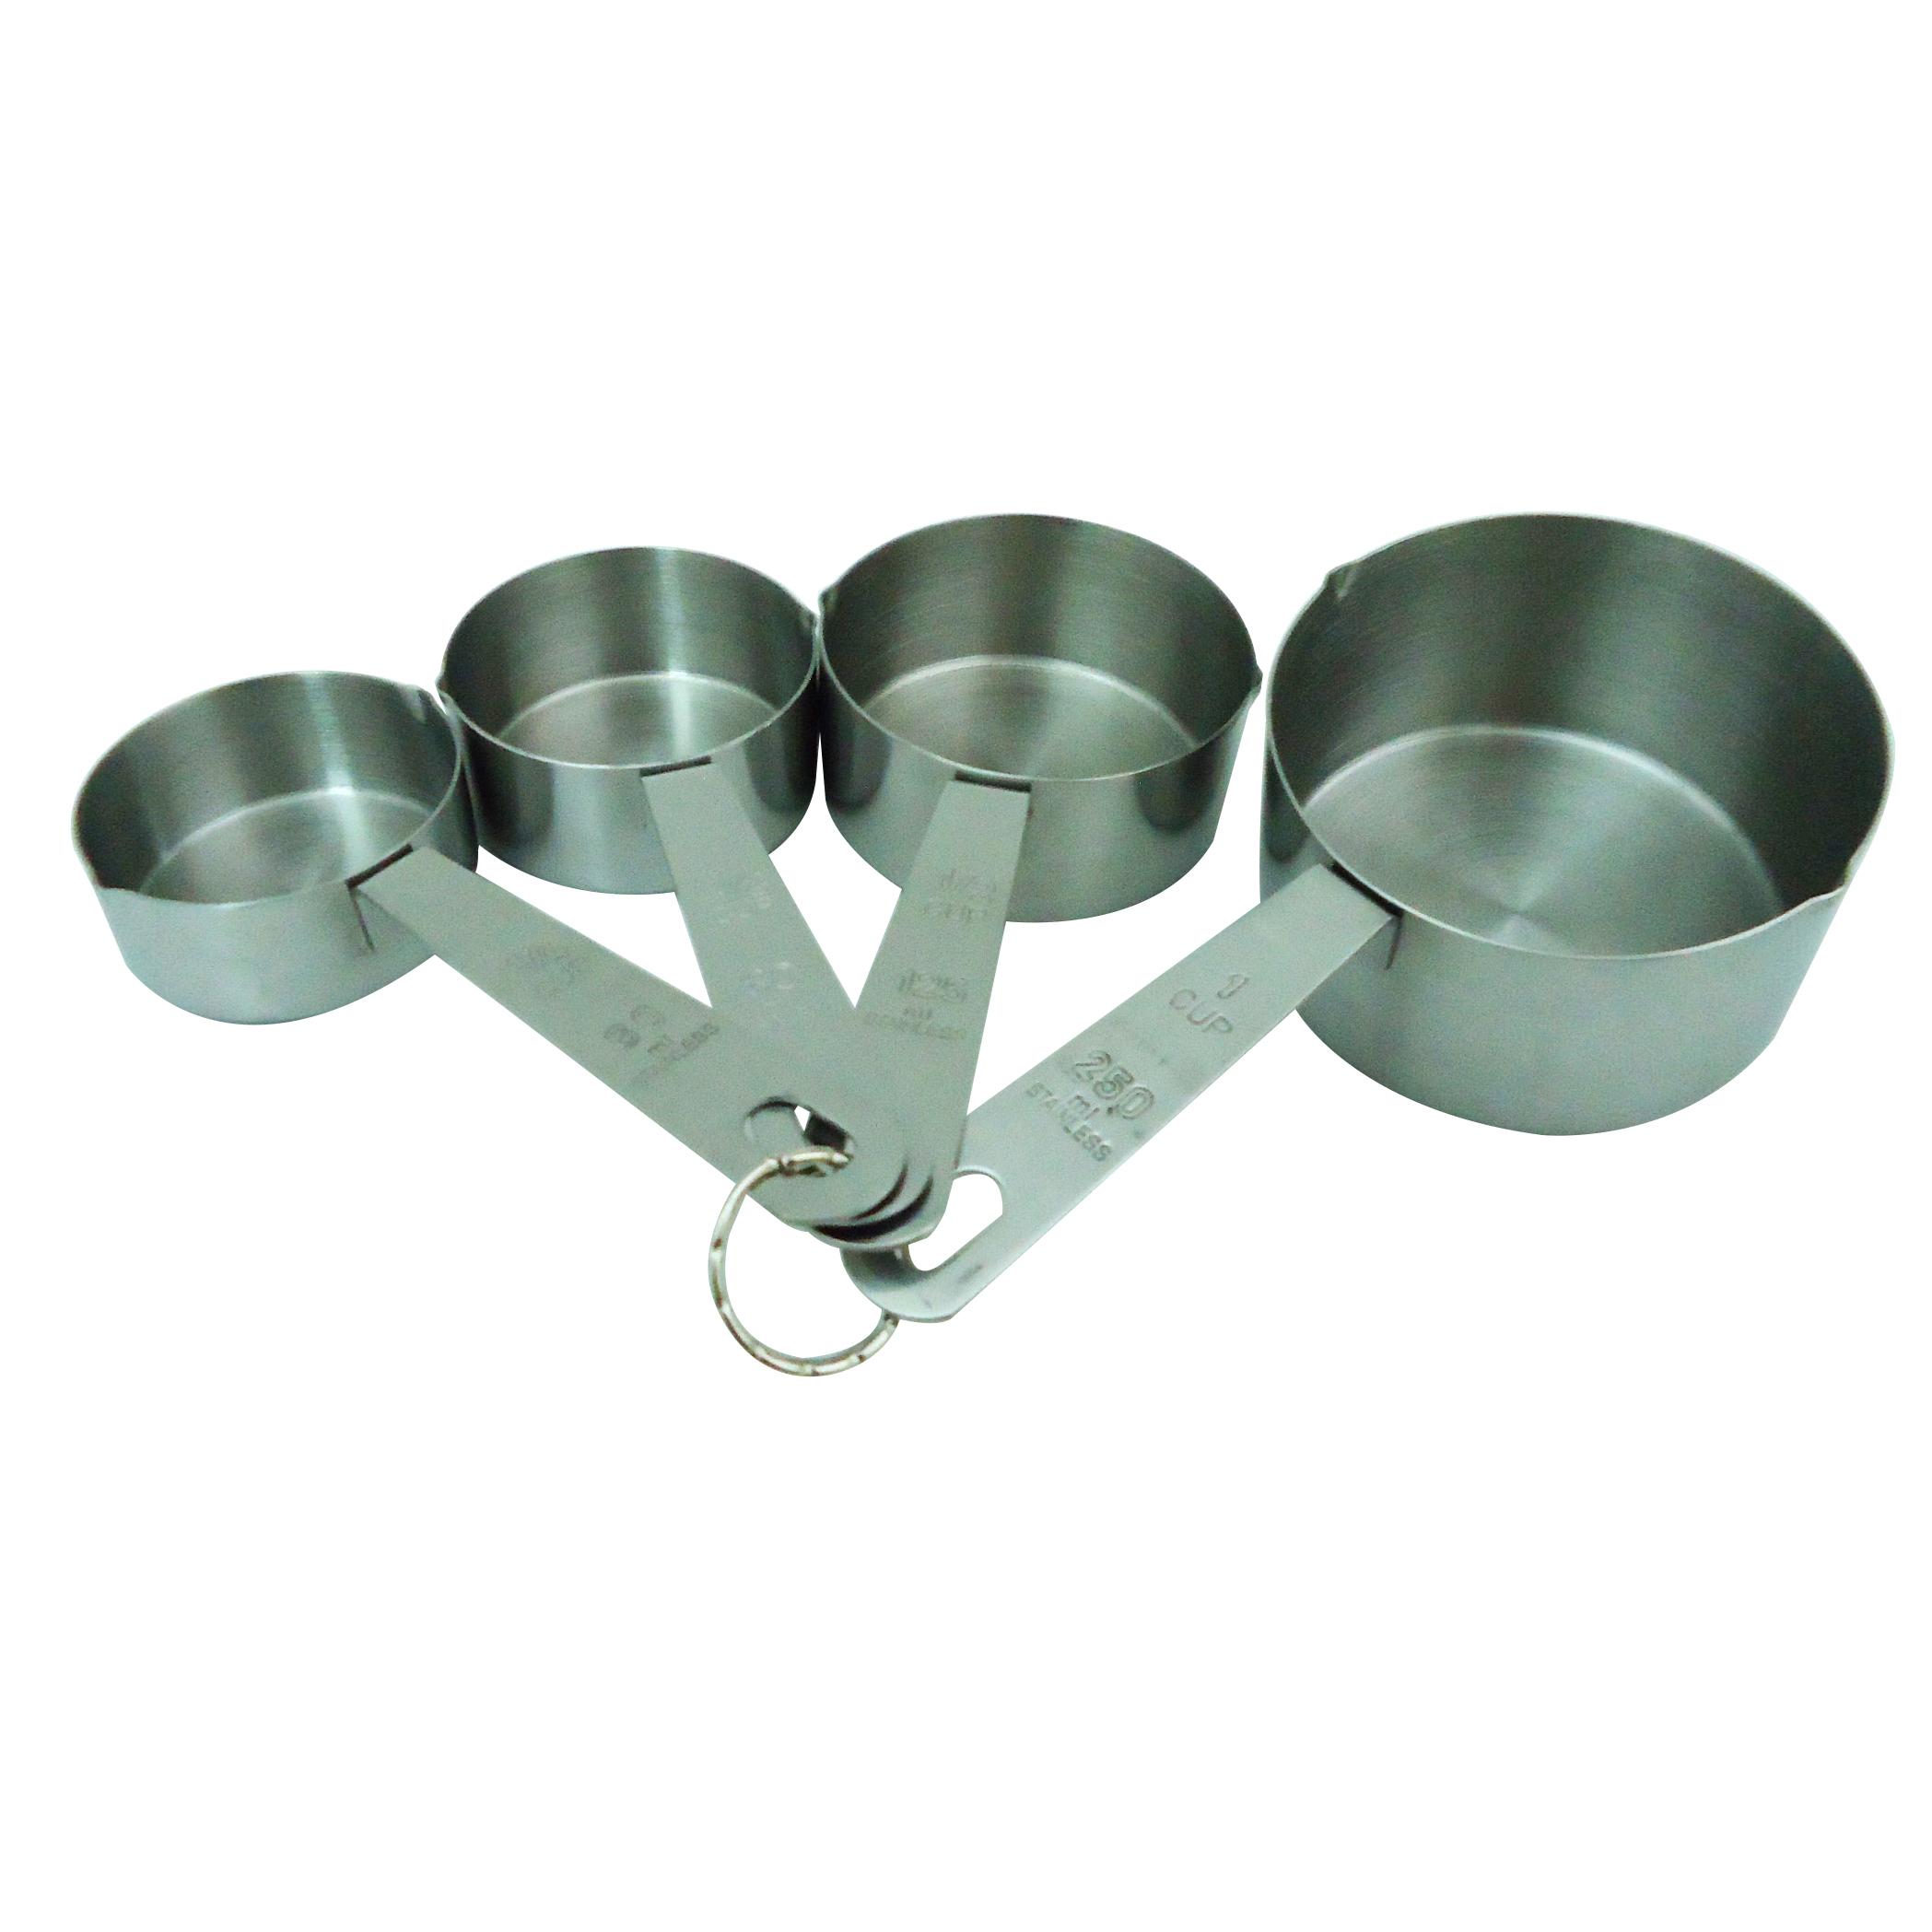 Lacor 67007 Σετ 4 Τεμαχίων Μεζούρες 60-80-125-250 ml επαγγελματικός εξοπλισμός   επαγγελματικά σκεύη είδη σερβιρίσματος   εργαλεία κο